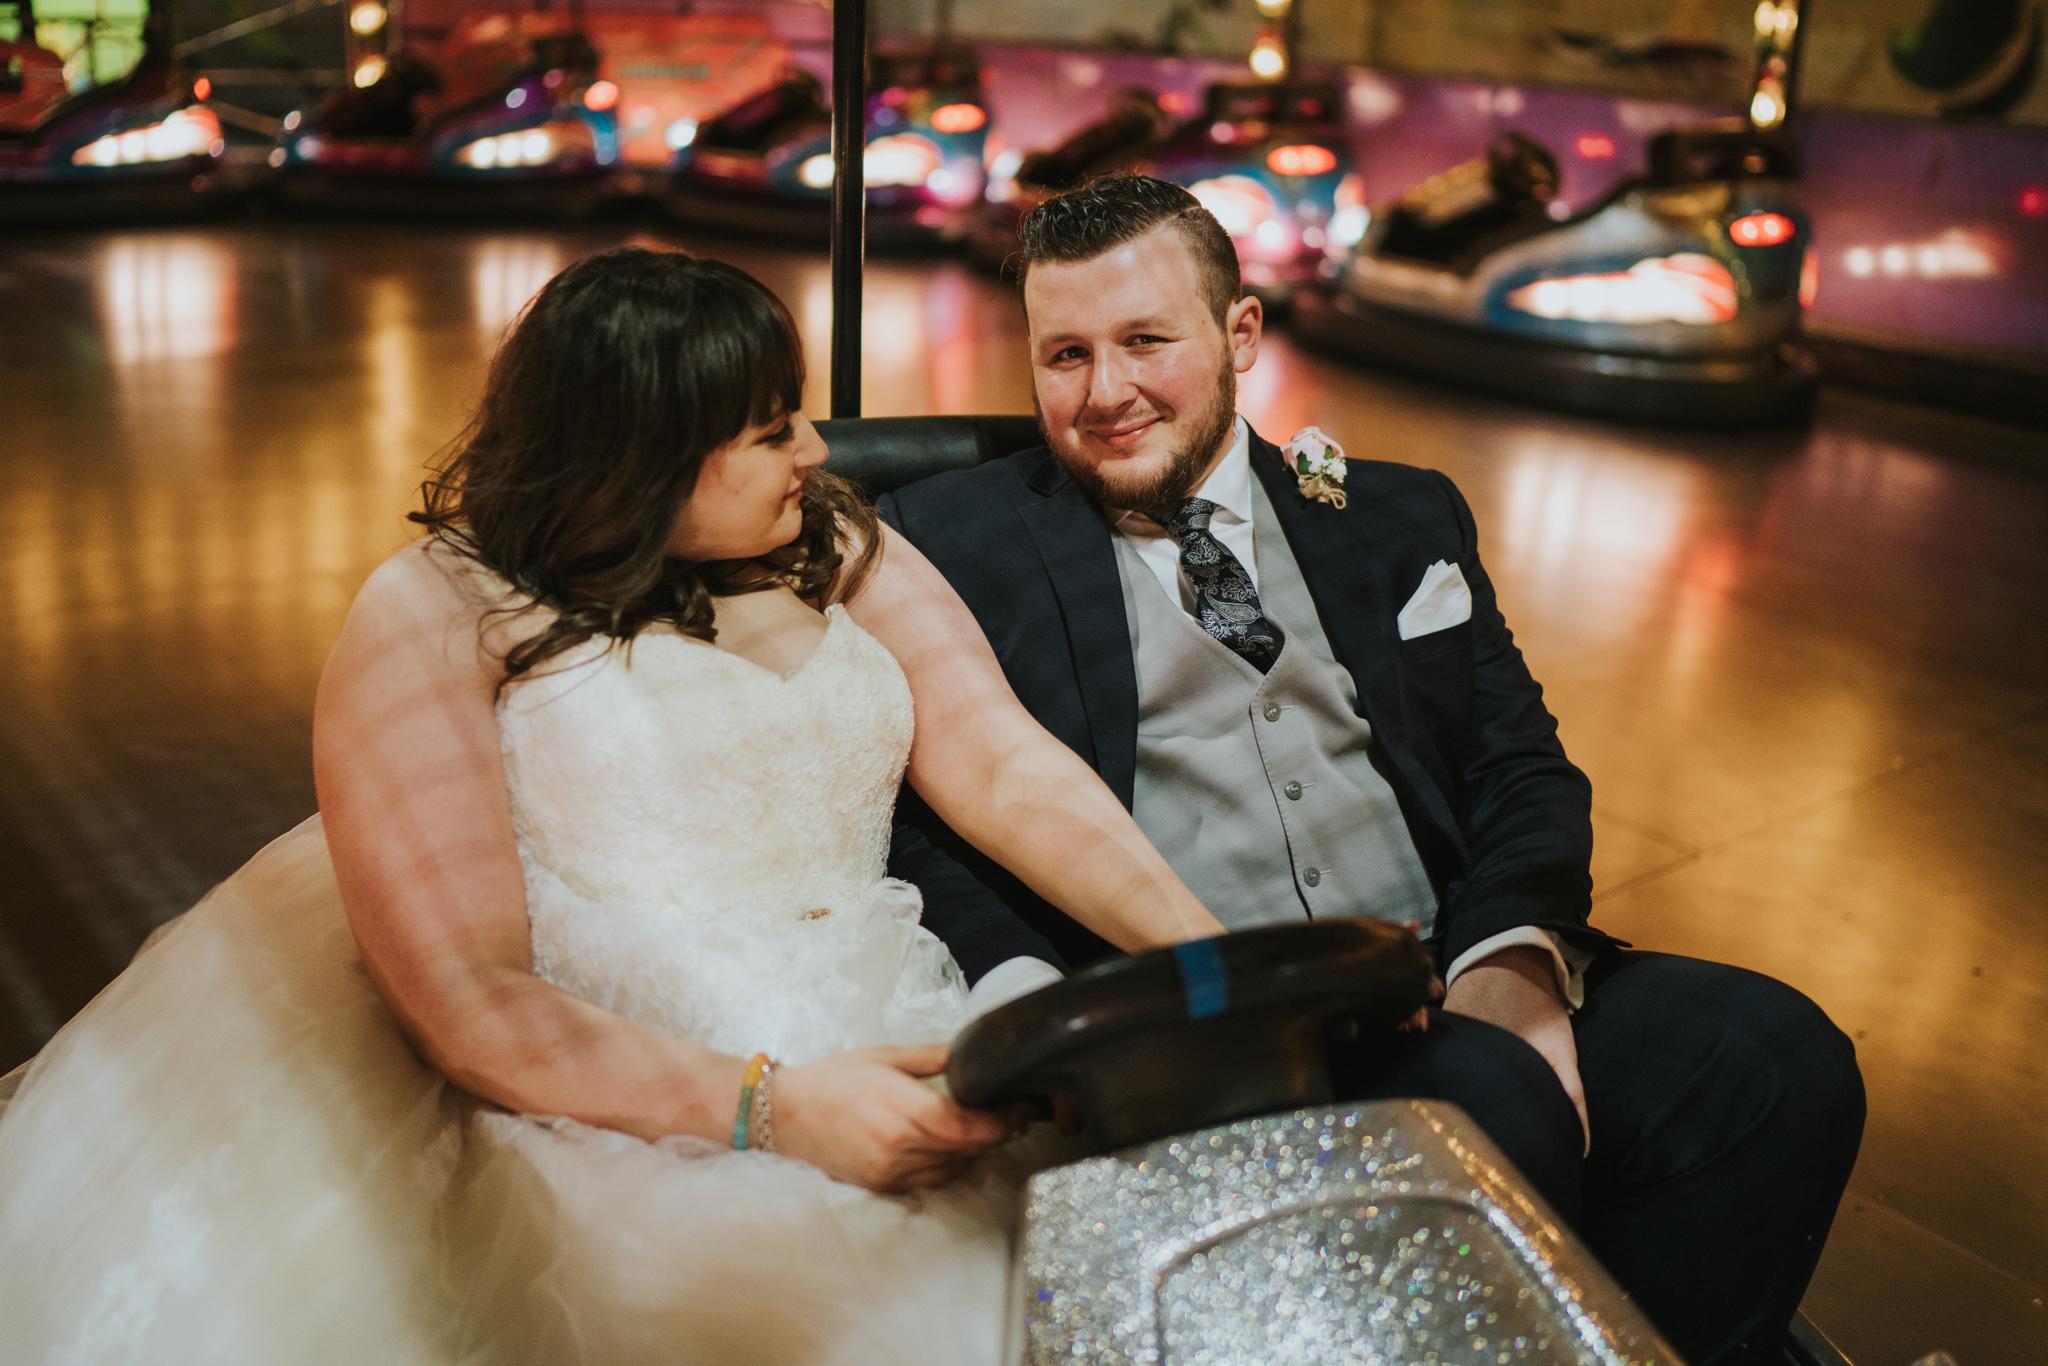 grace-sam-old-barn-clovelly-devon-wedding-photographer-grace-elizabeth-essex-suffolk-norfolk-wedding-photographer (102 of 132).jpg